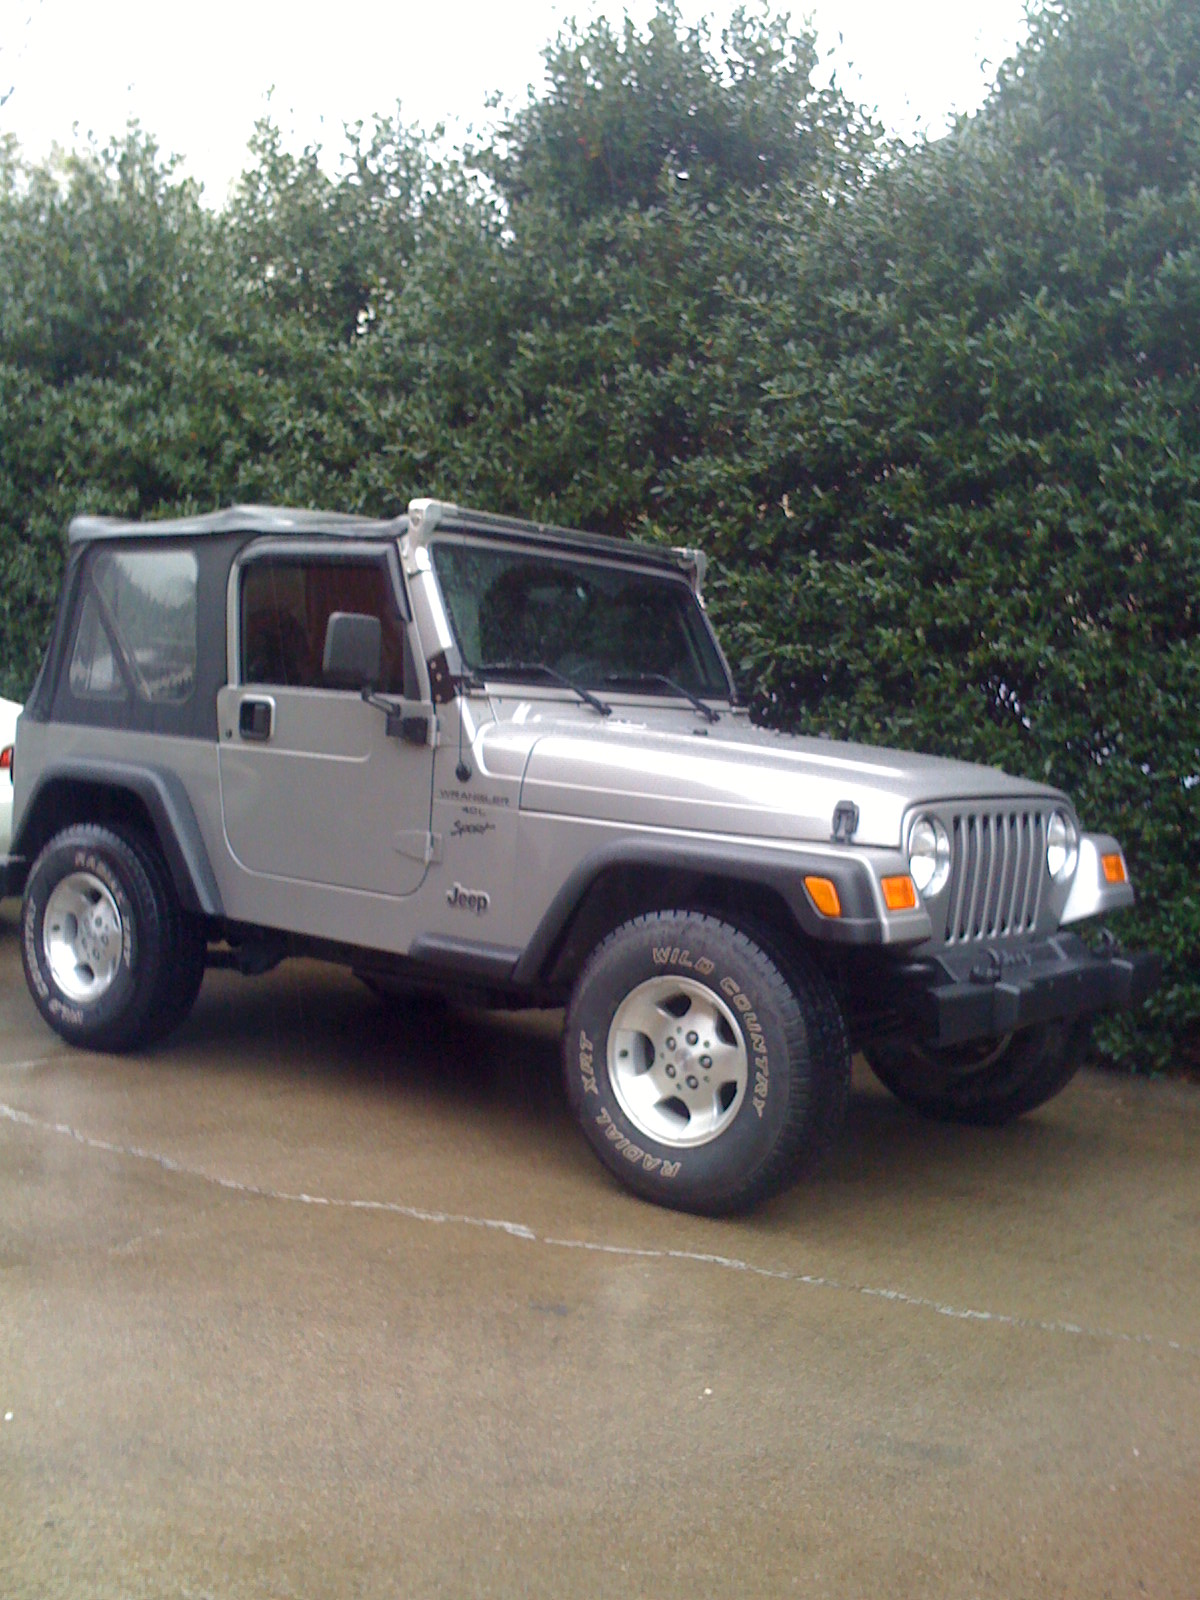 Jeep_001.jpg